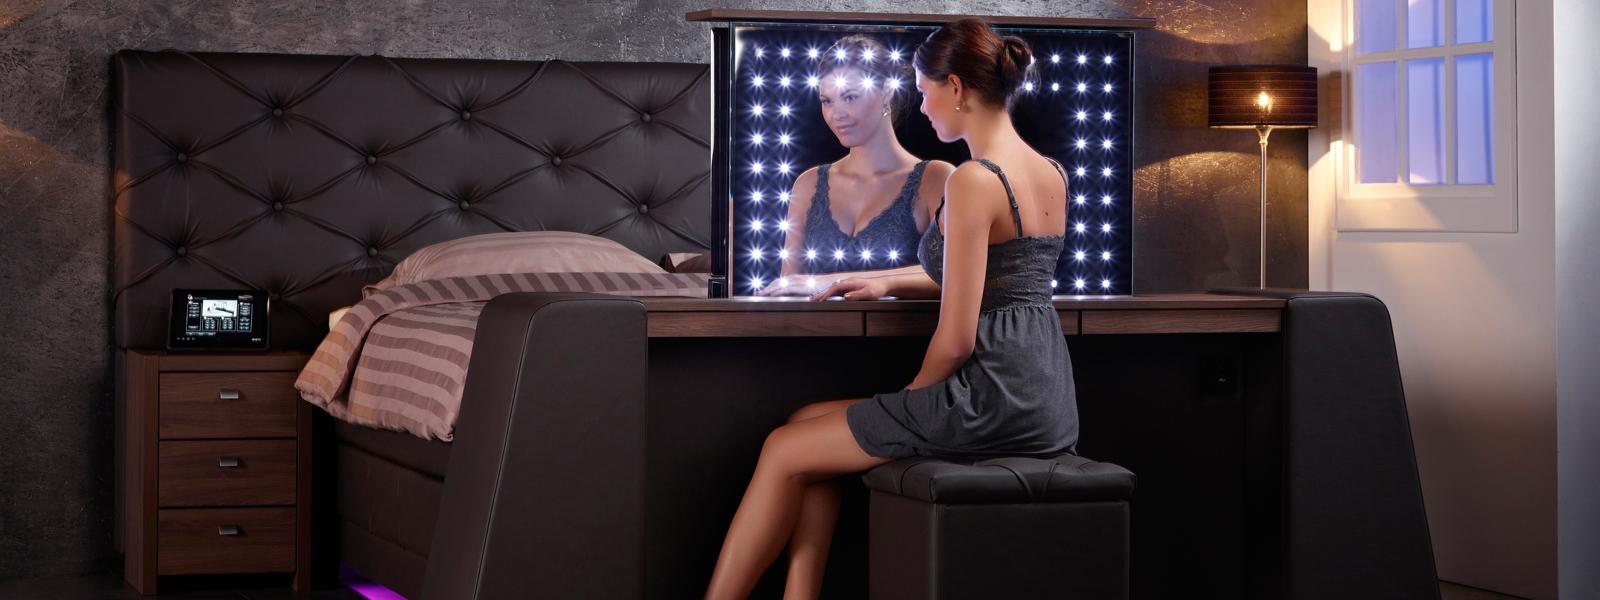 boxspring met kaptafel en tv